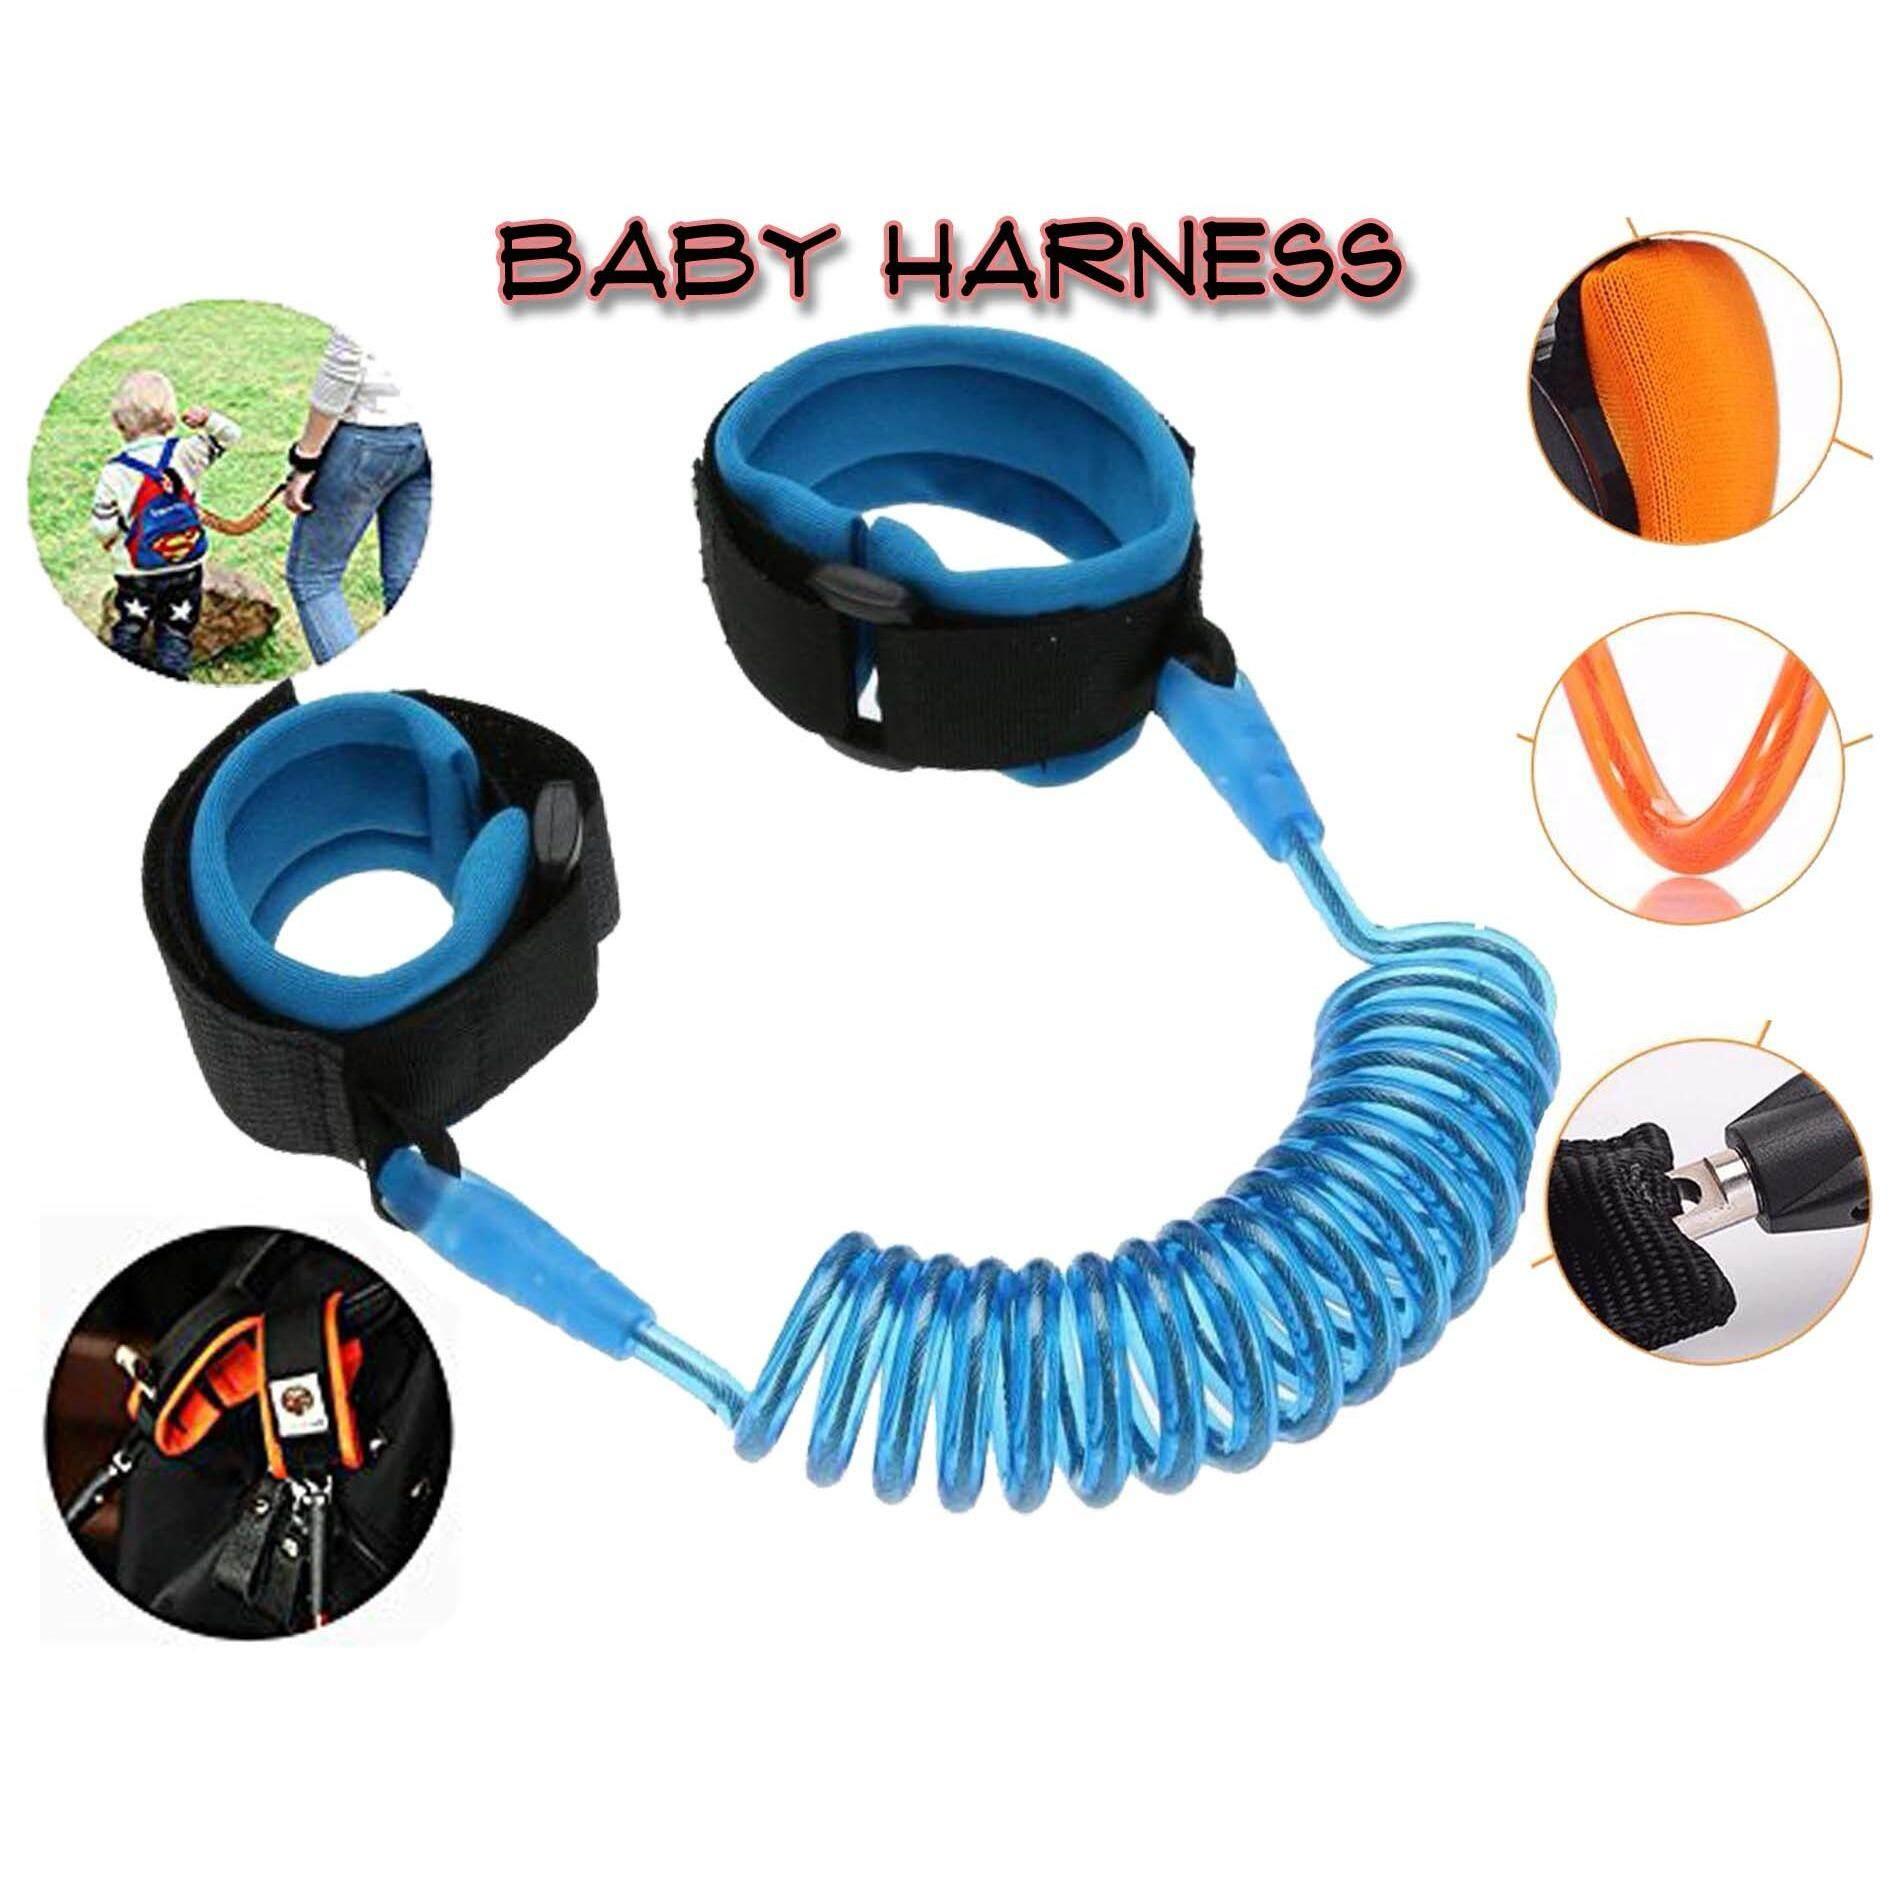 Adjustable Kids Safety Anti Lost 1.5m Wrist Band/ Harness/ Leash Strap